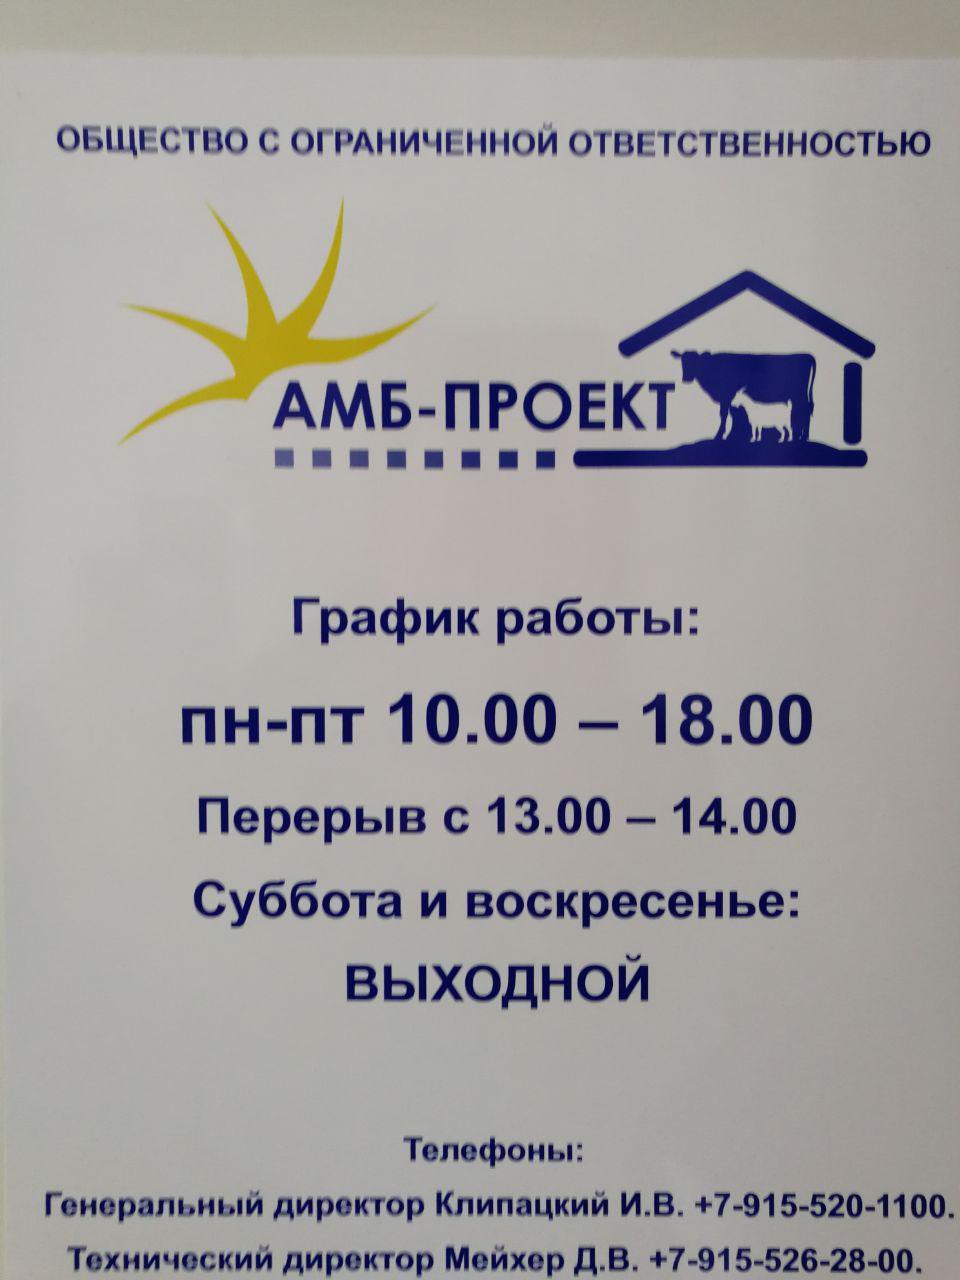 АМБ-ПРОЕКТ